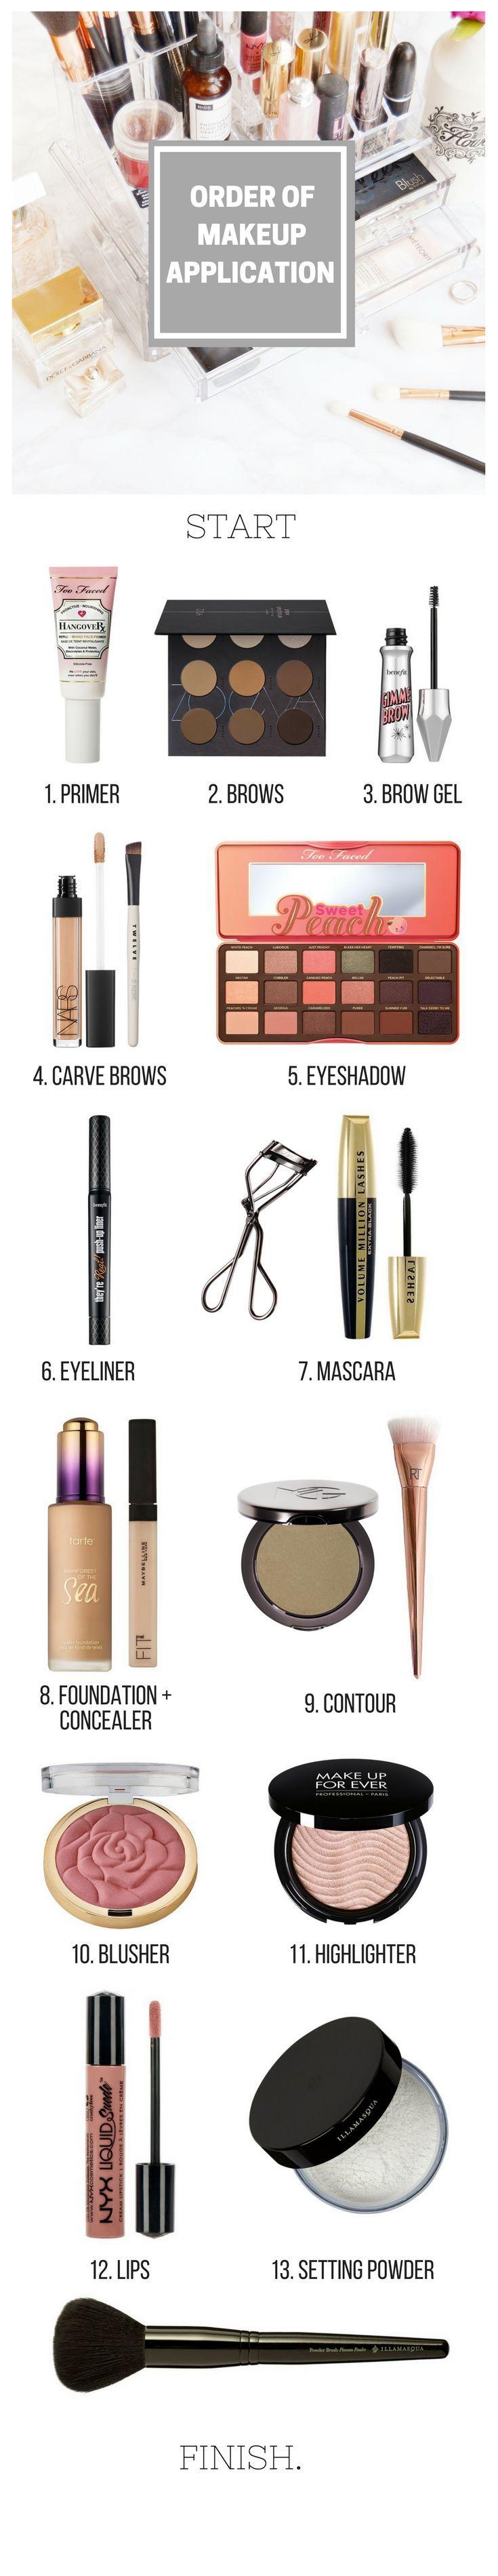 The Order of Makeup Application Makeup Tips, Tricks